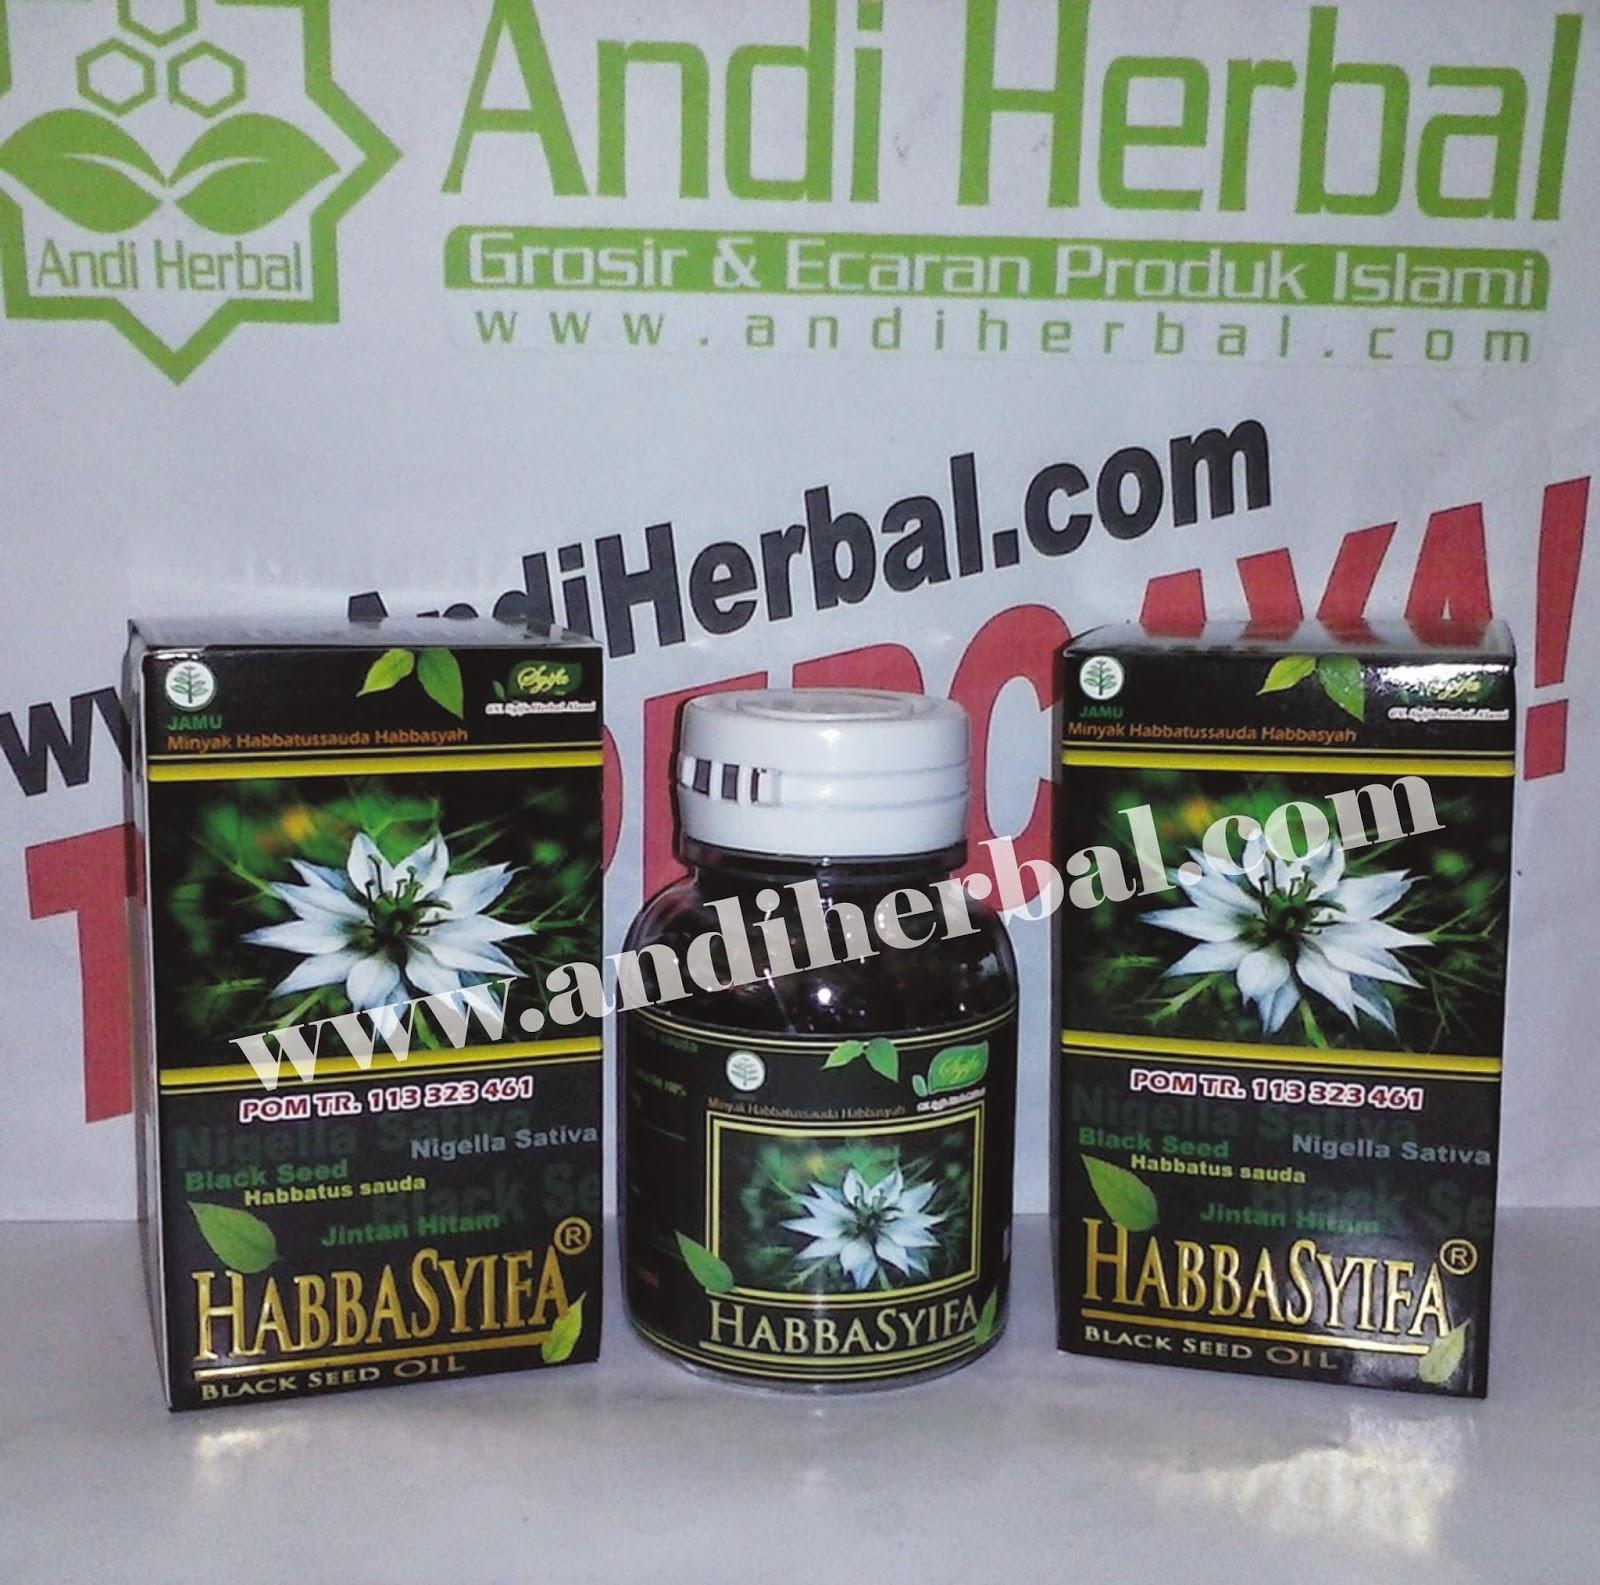 Minyak Habbatussauda Habbasyifa Black Seed Oil 90 kaps Andiherbal.com